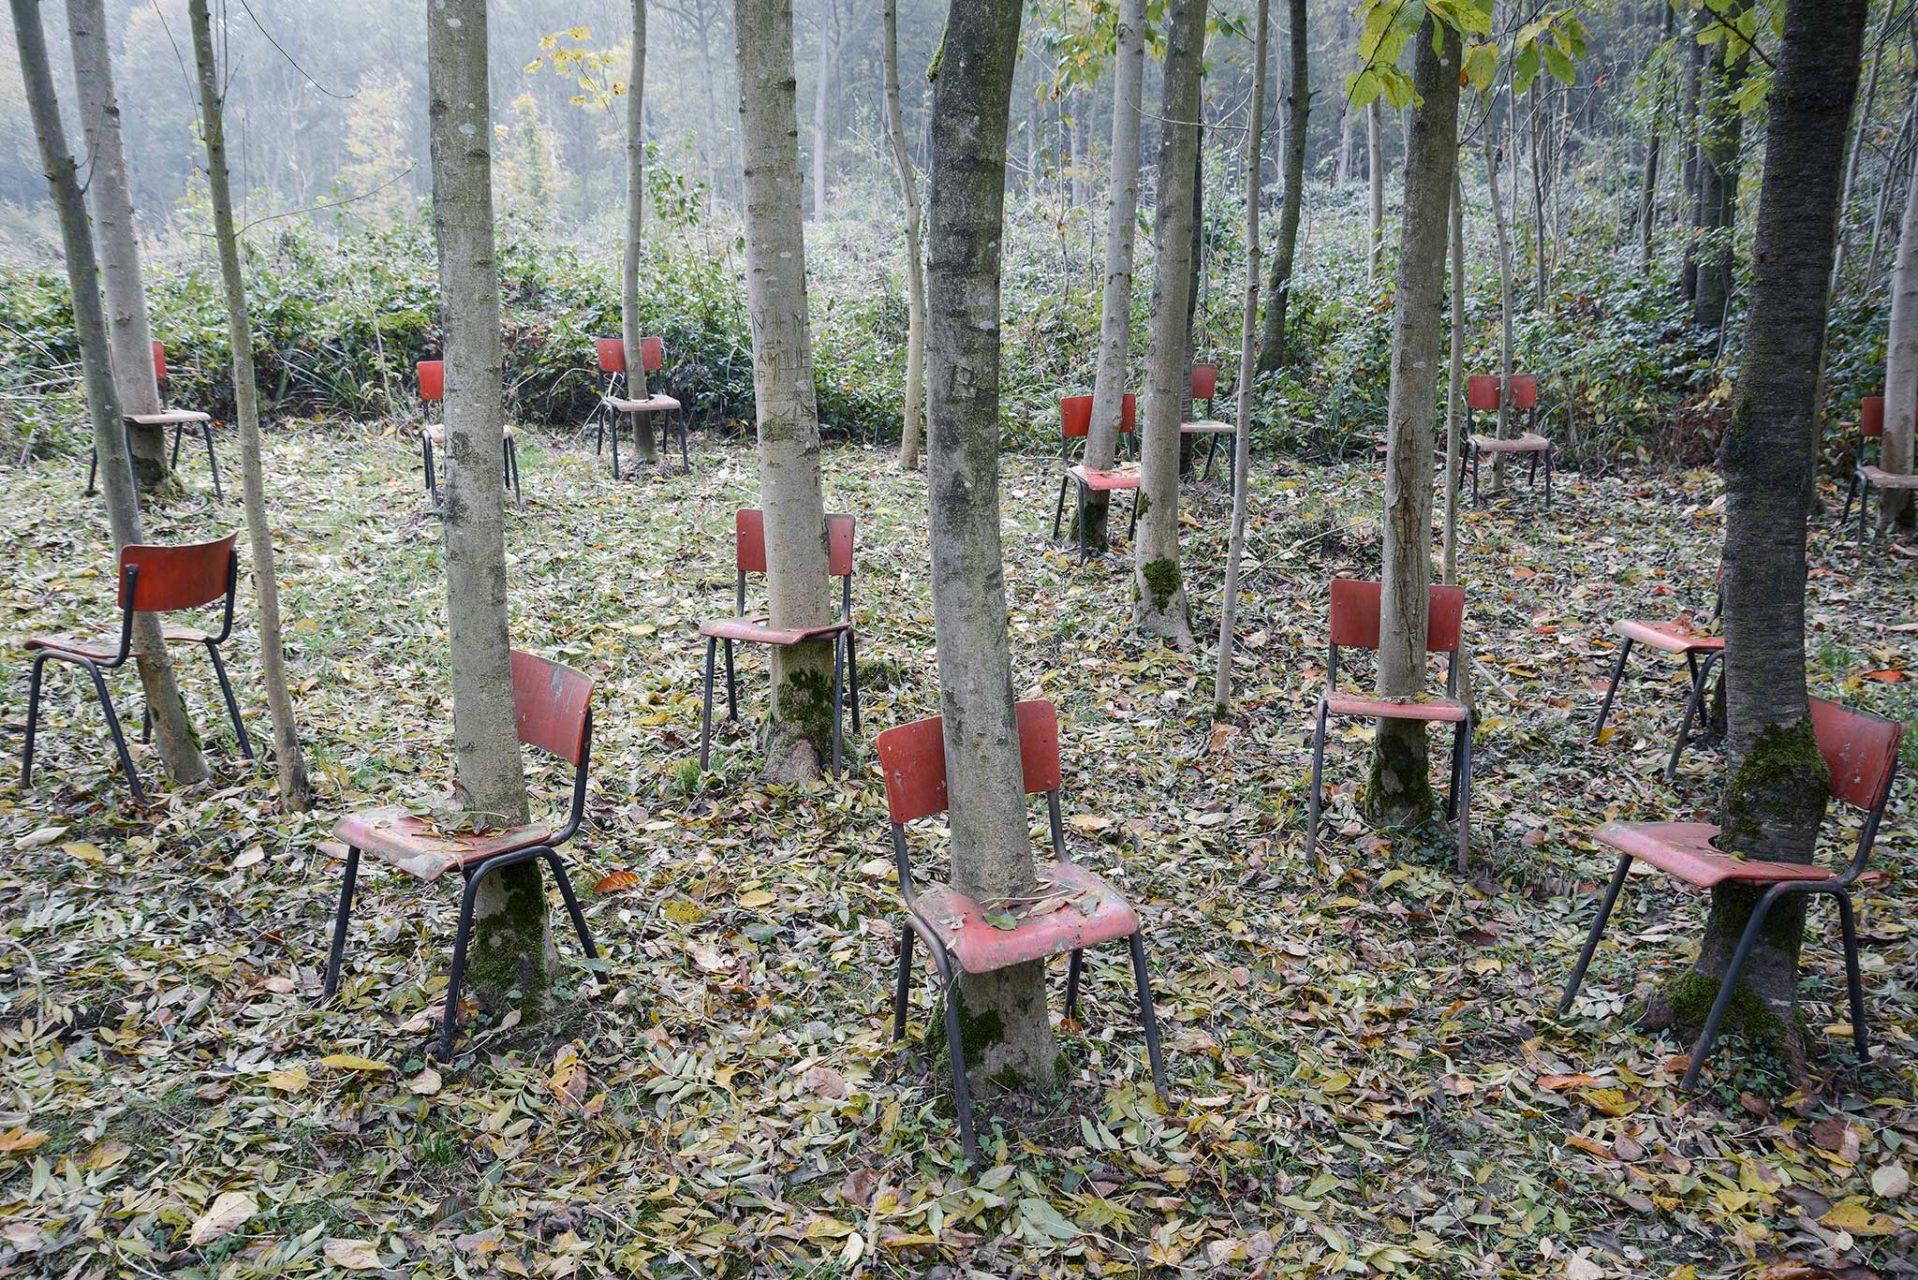 Tante piccole sedie rosse